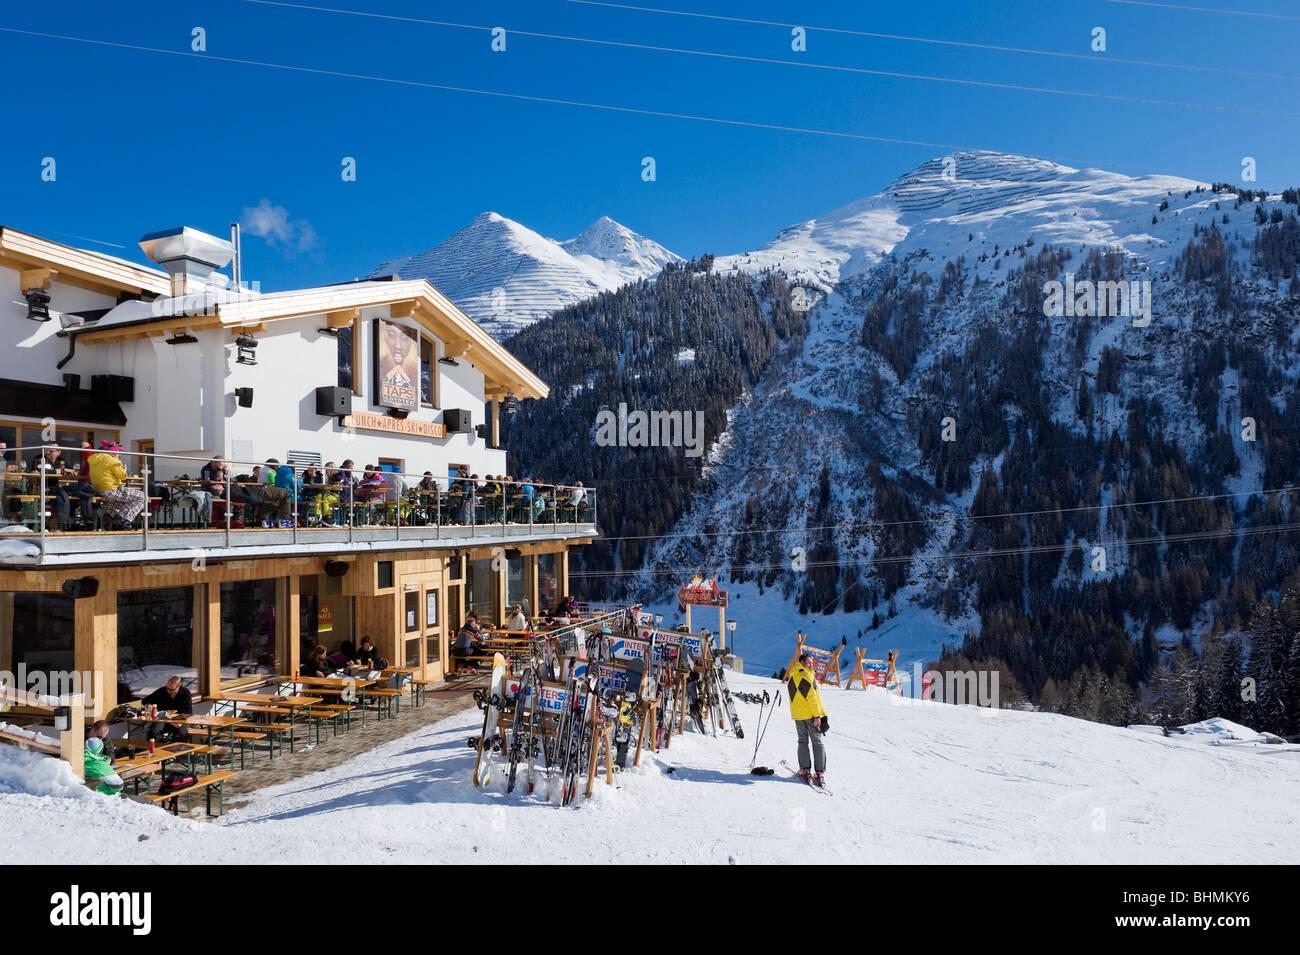 The popular Taps Coyotes mountain bar and restaurant, St Anton, Arlberg ski region, Vorarlberg, Austria - Stock Image